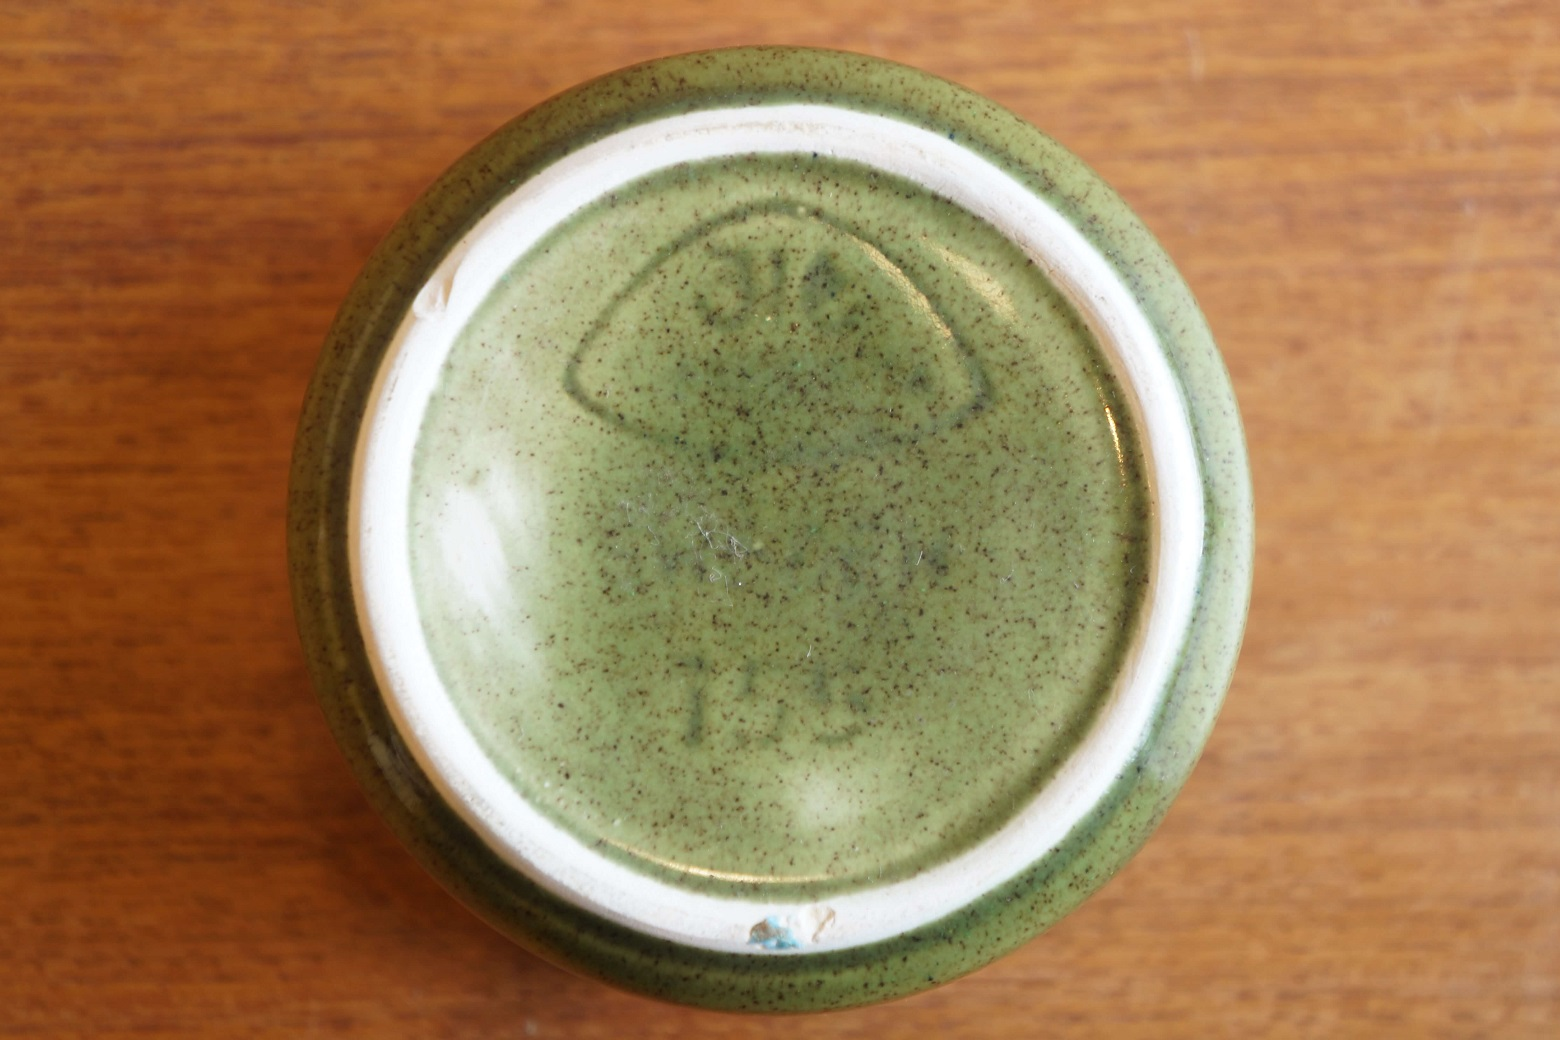 Swedish Vintage Jie Gantofta Spice Bowl Set/スウェーデン ヴィンテージ ジィ ガントフタ スパイスボウルセット